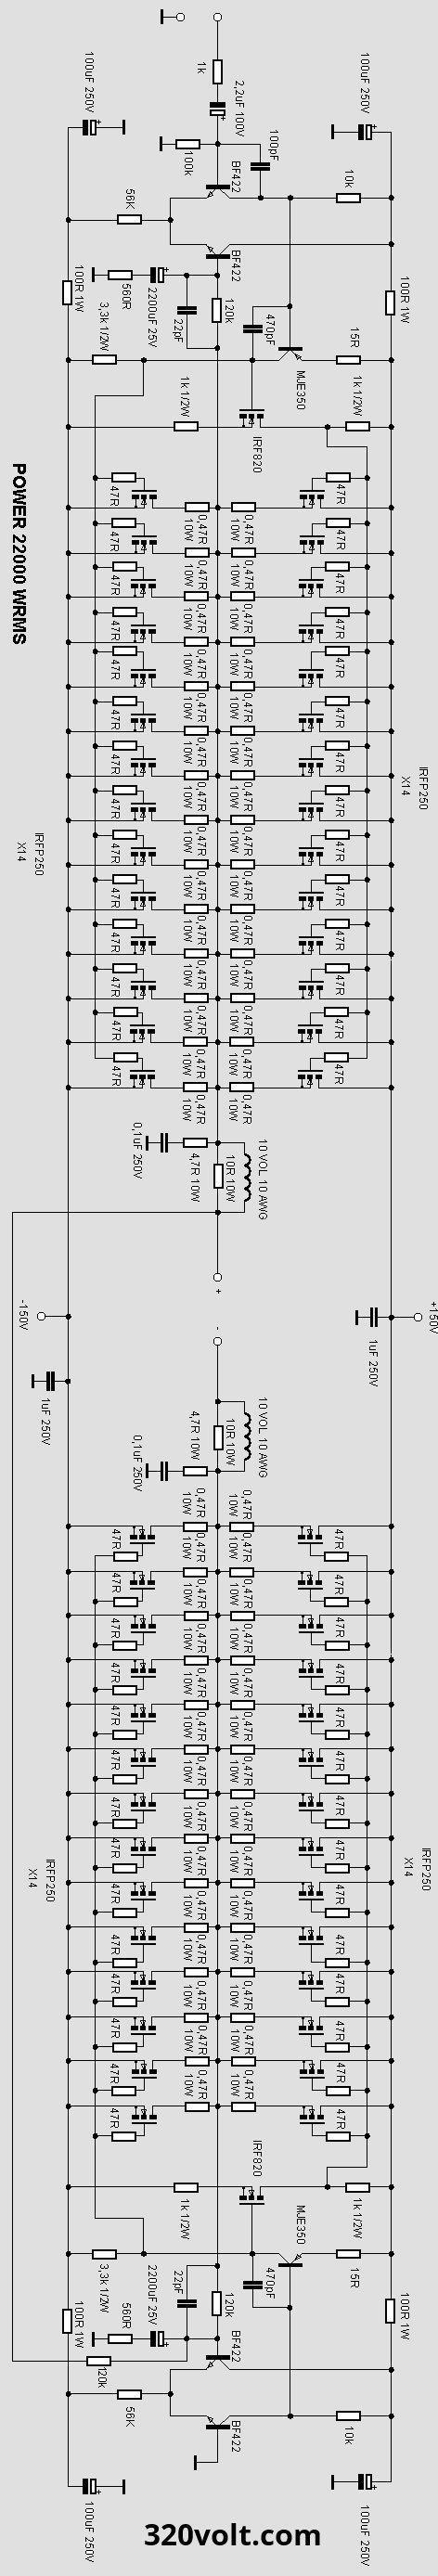 High Power 2200W Amplifier Circuit transistor amplifier ...